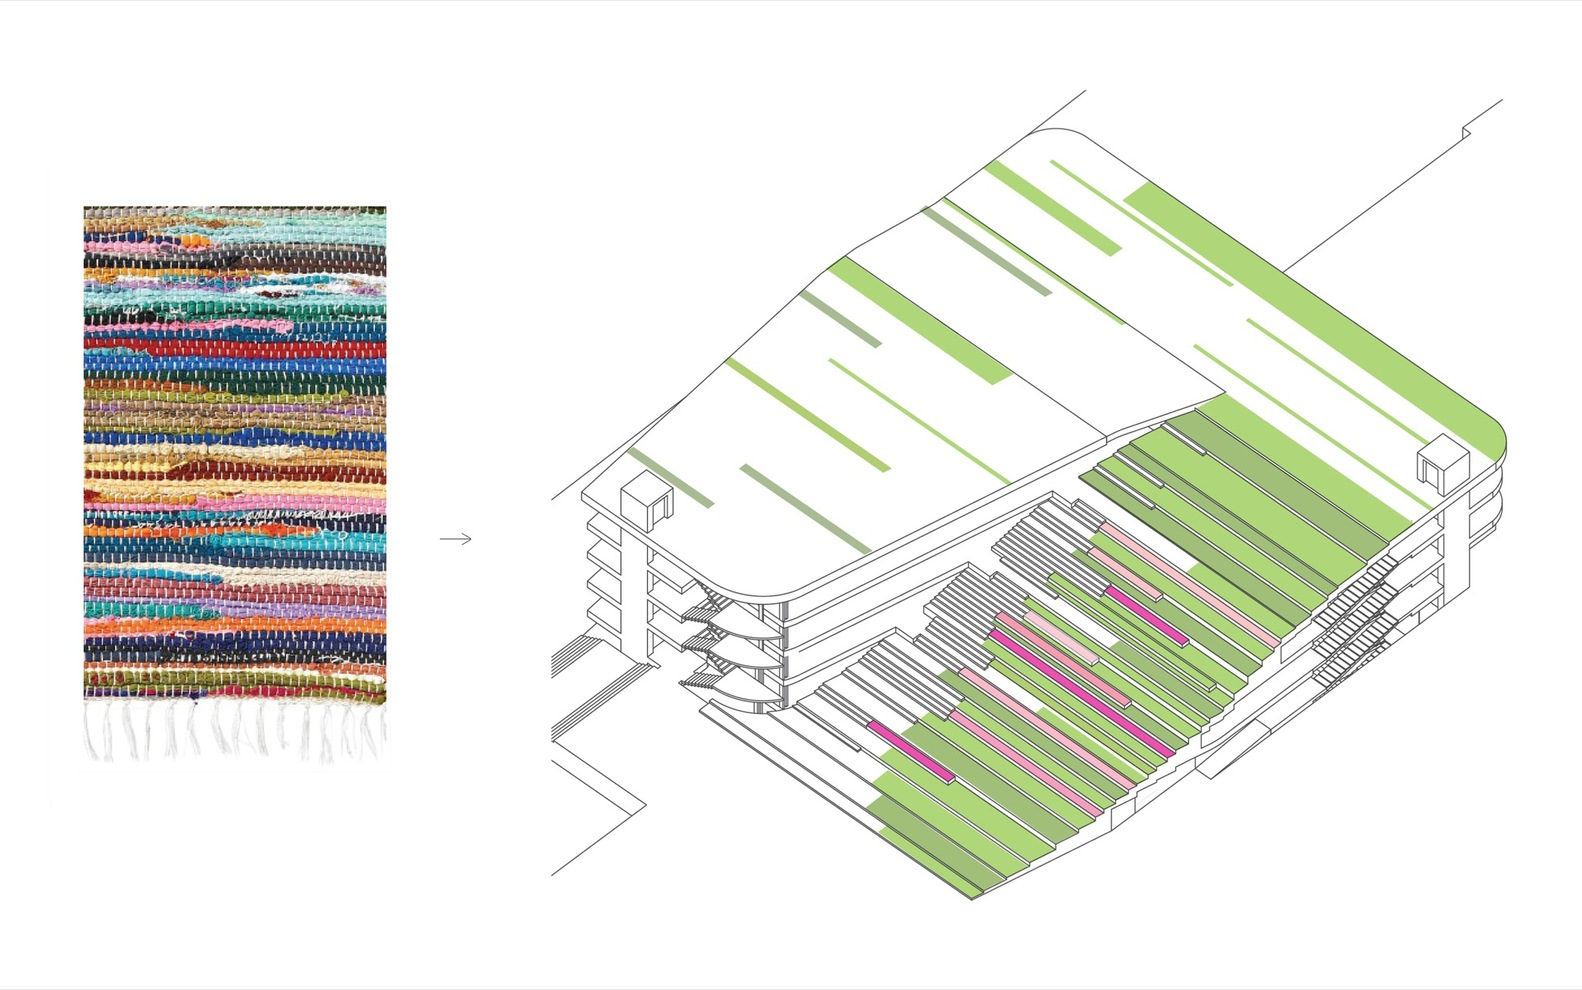 medium resolution of the parking garage that moonlights as a sledding slope white arkitekter henning larsen architects diagram